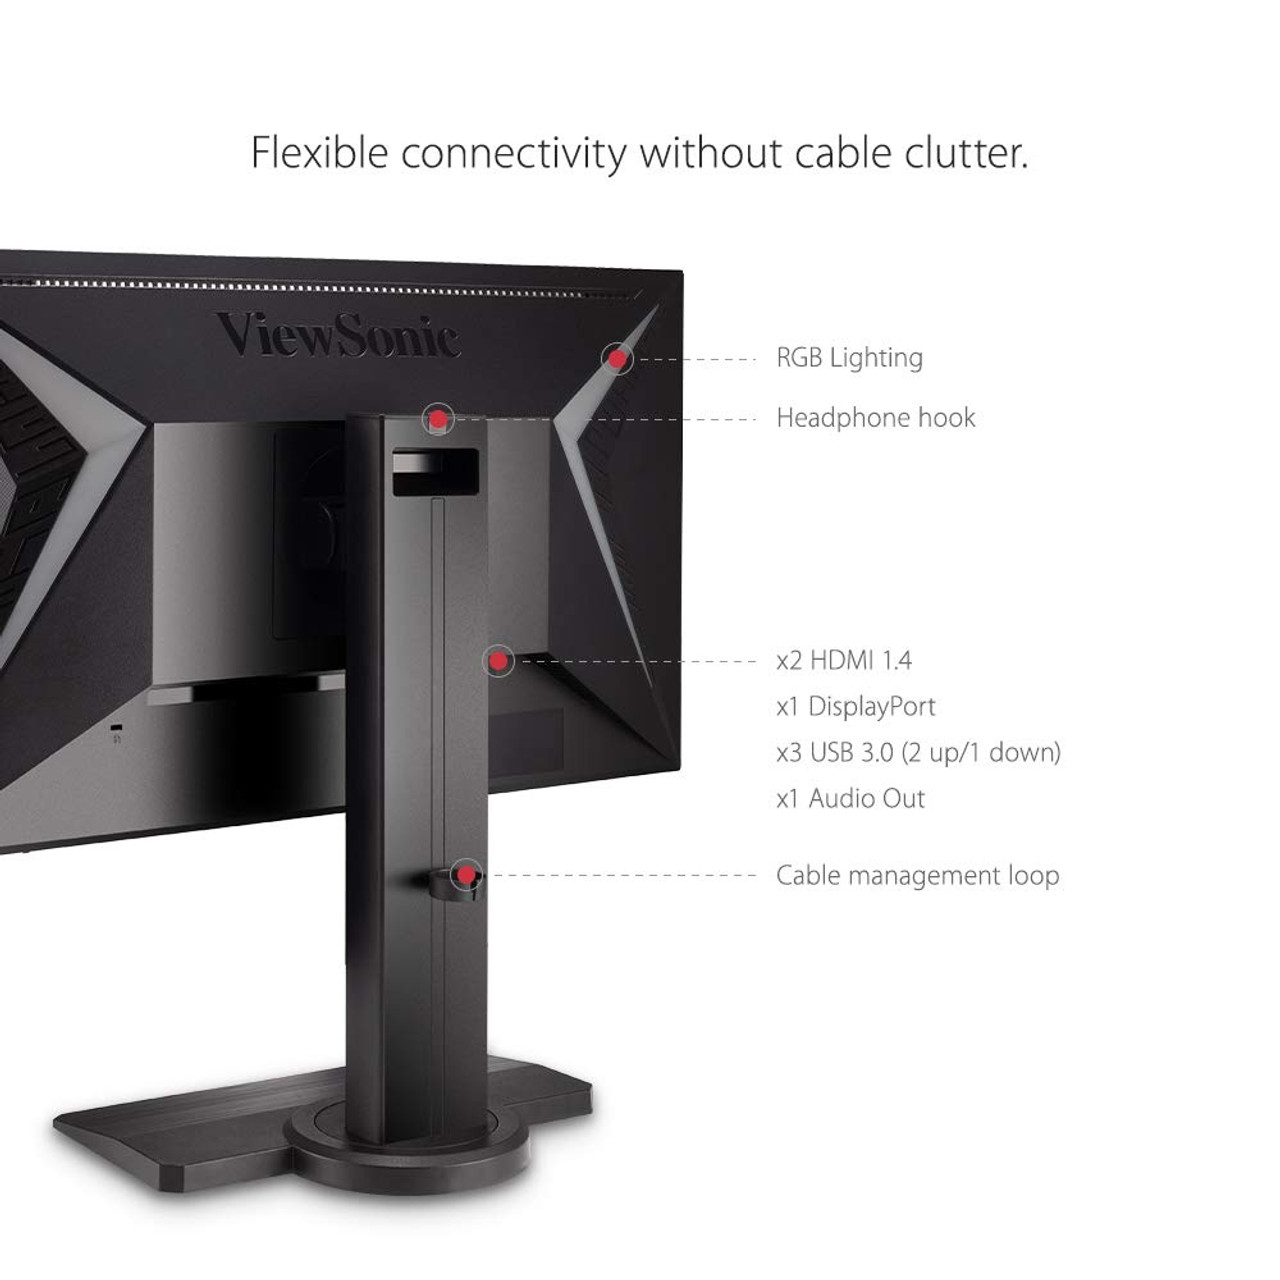 "ViewSonic XG240R-R 24"" 16:9 144 Hz FreeSync Gaming LCD Monitor - C Grade Refurbished"